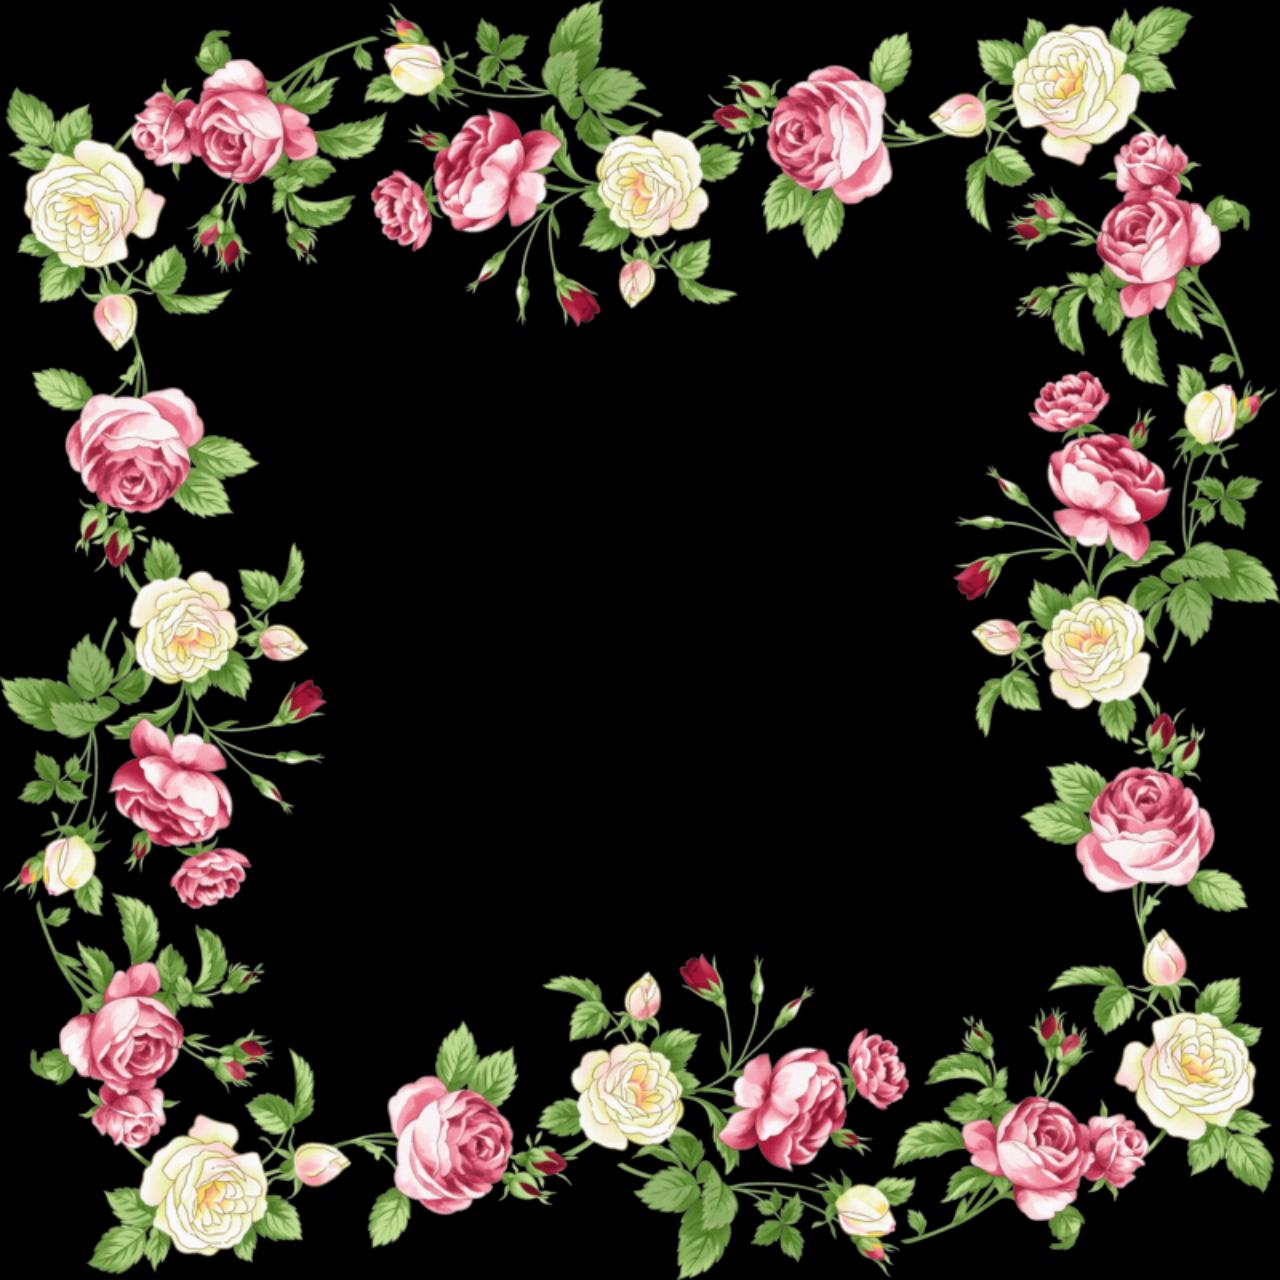 Floral border png. Flowers borders transparent images